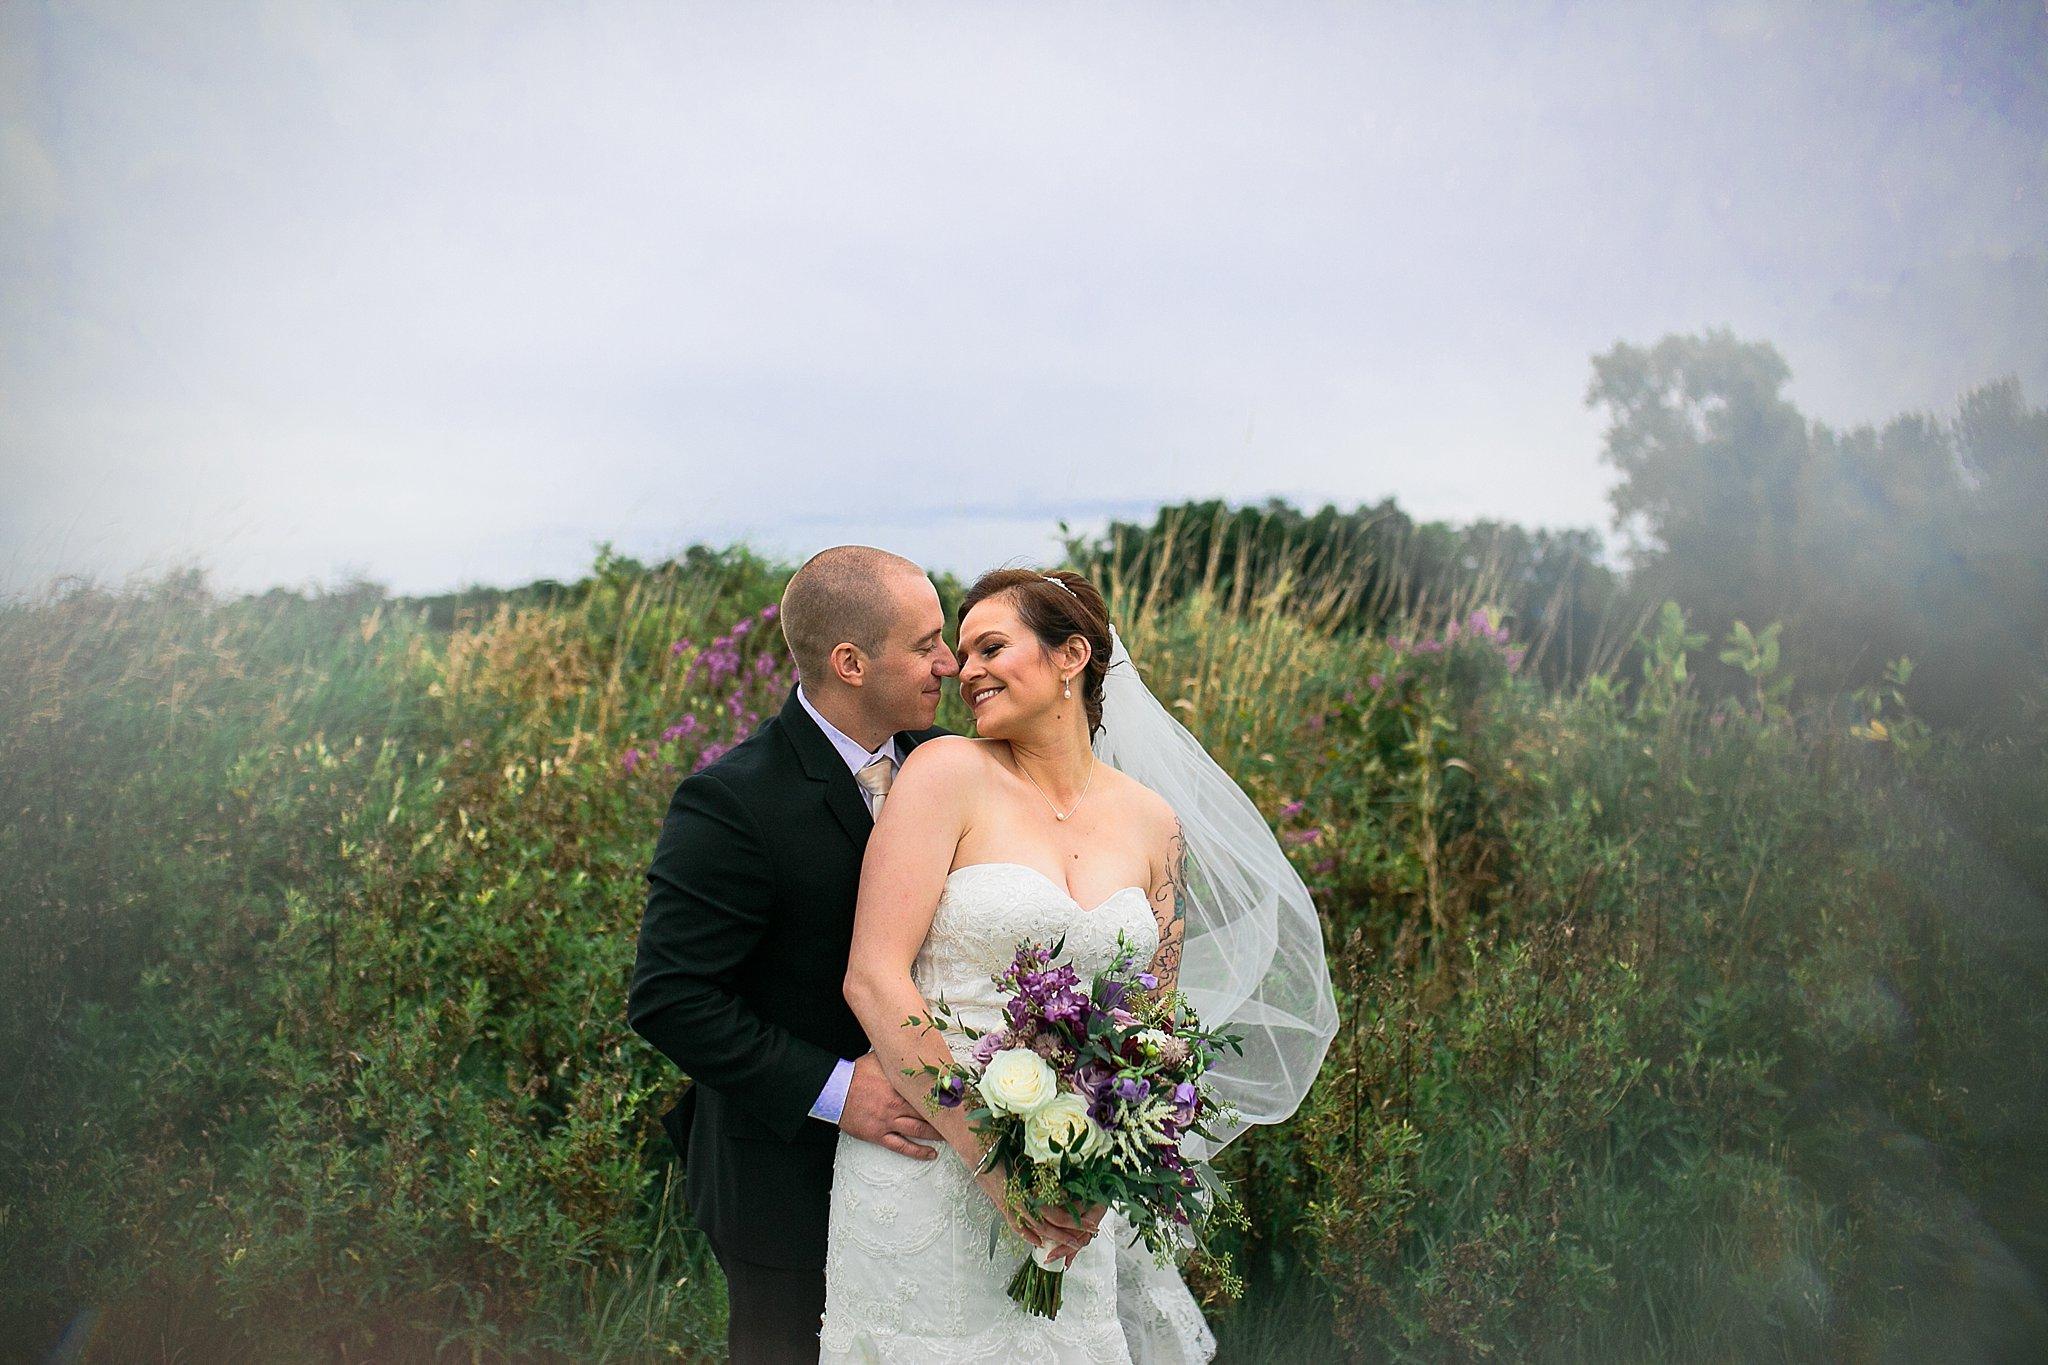 Links at Unionvale Wedding Lagrangeville Wedding Hudson Valley Wedding Photographer Sweet Alice Photography56.jpg